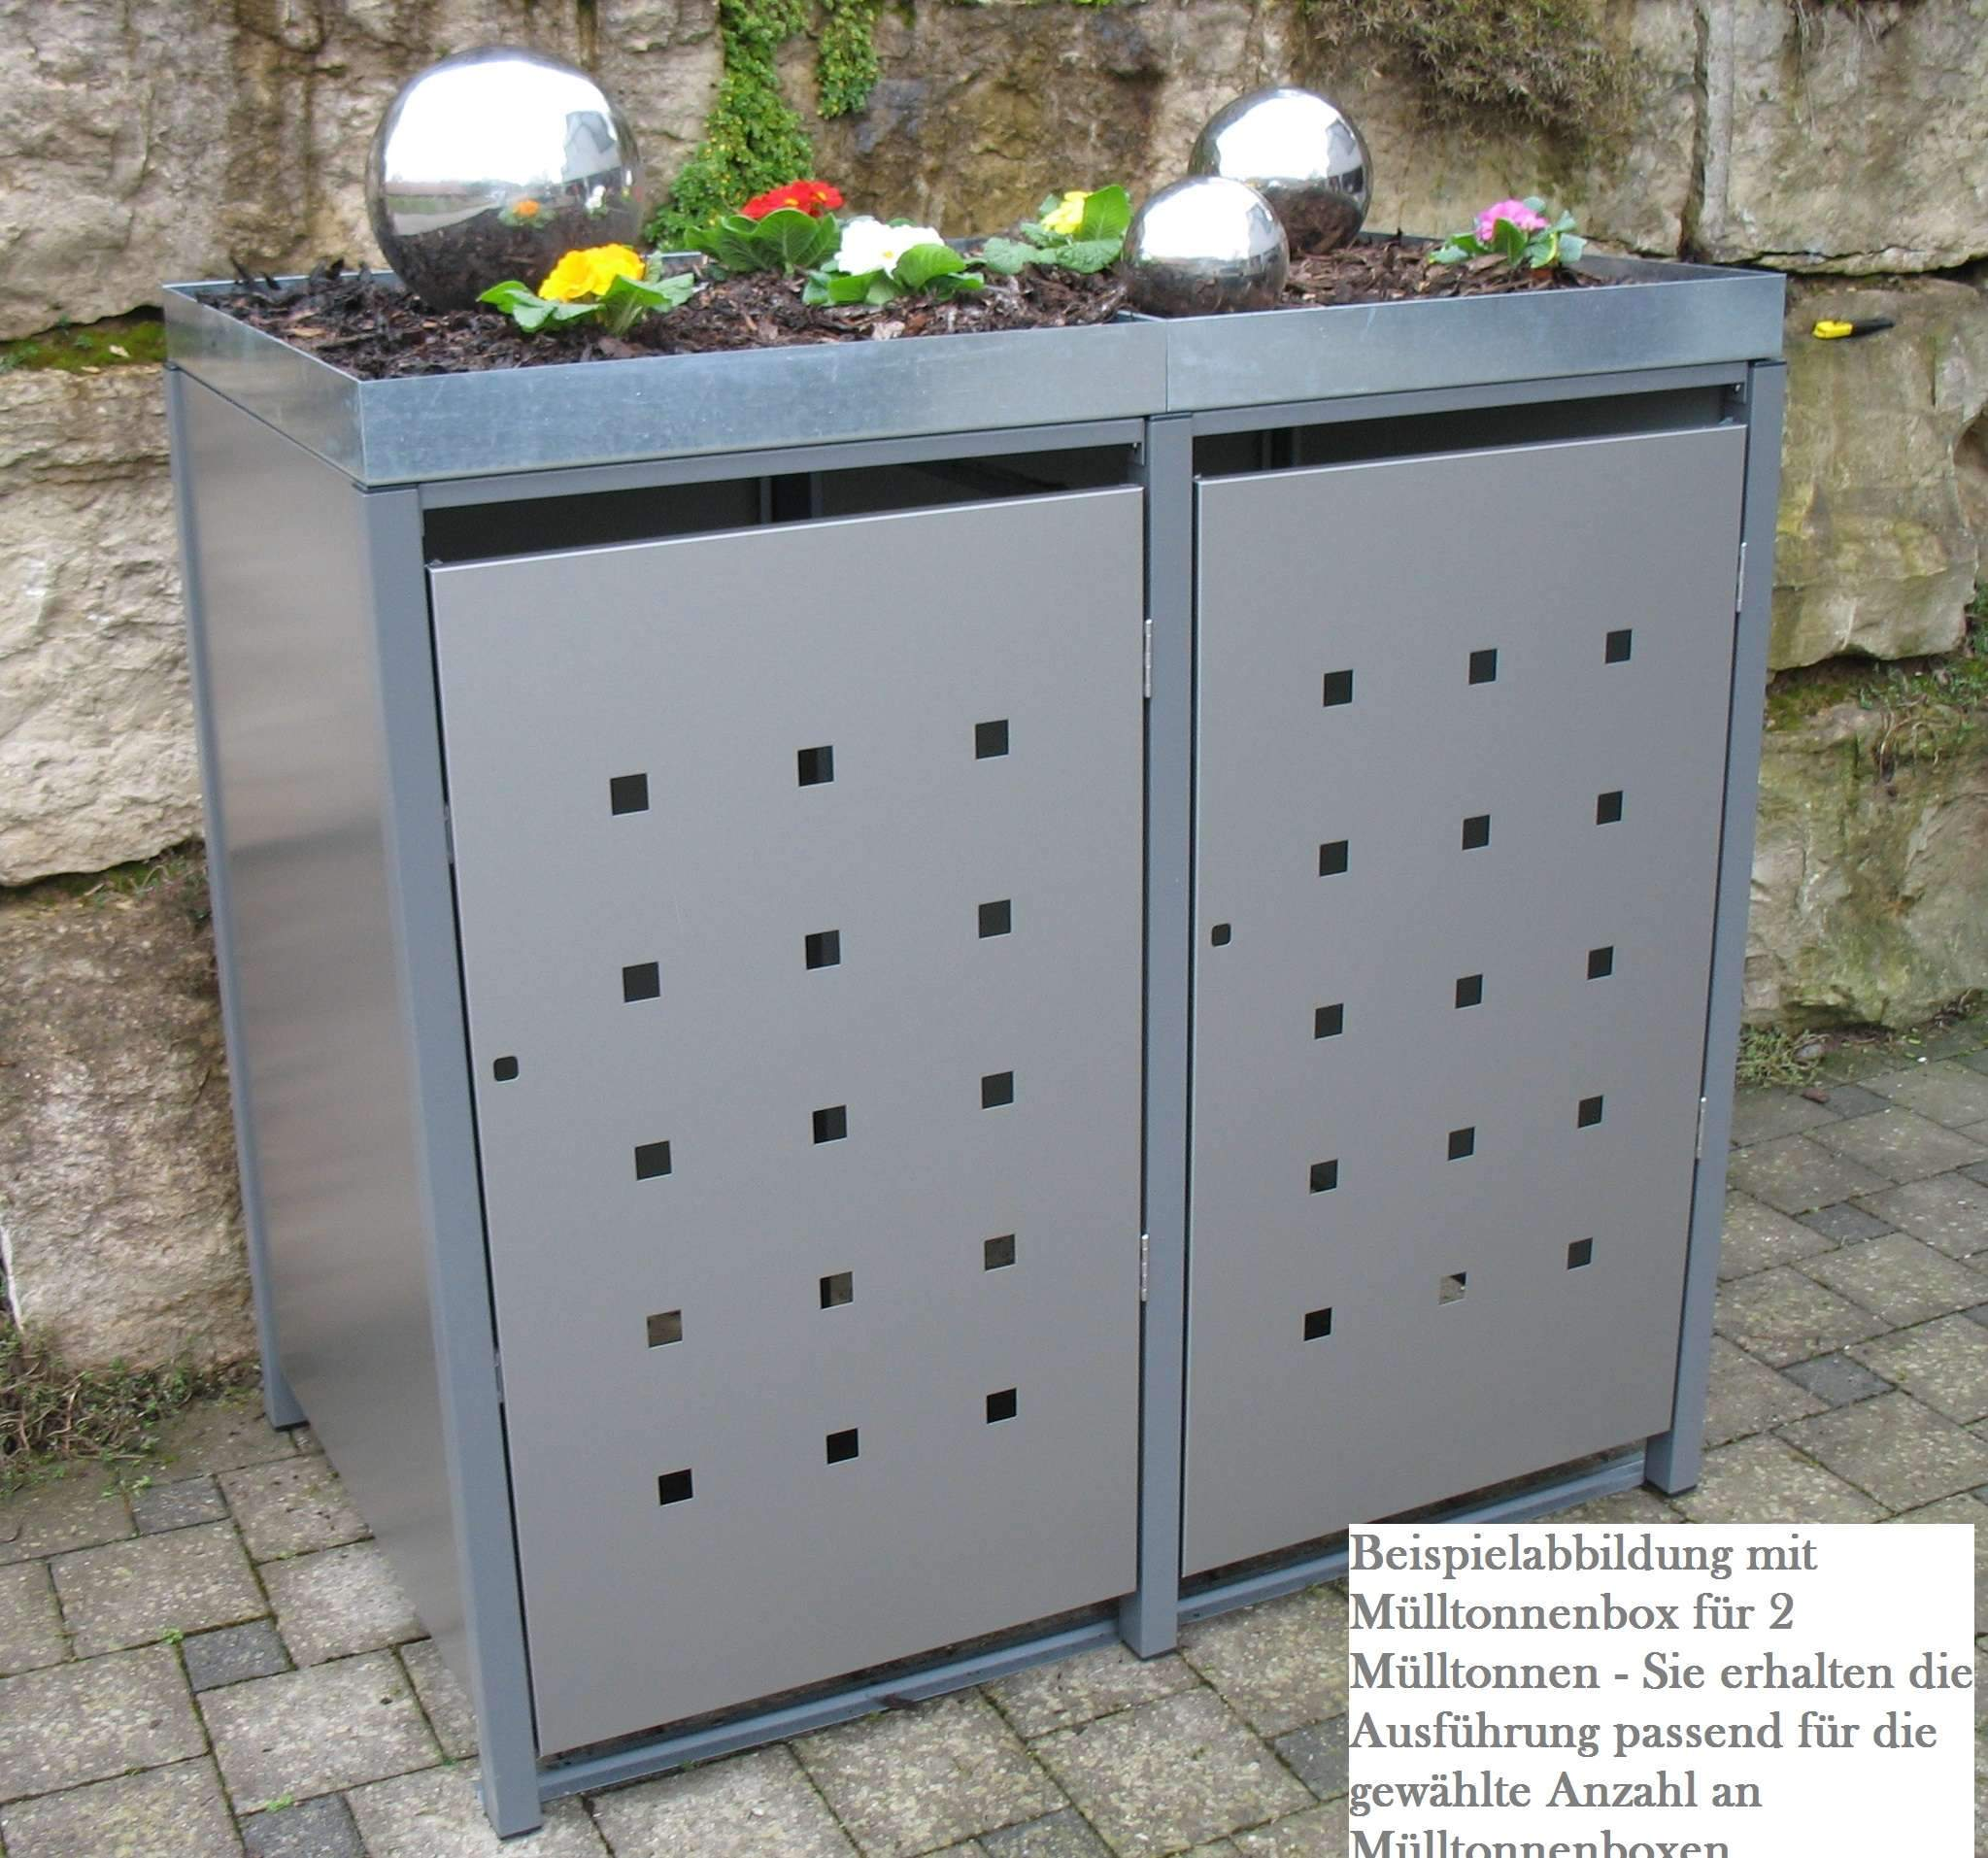 Muelltonnenbox dunkelgraumetallik5c6abe3ecf9f7 1280x1280 2x